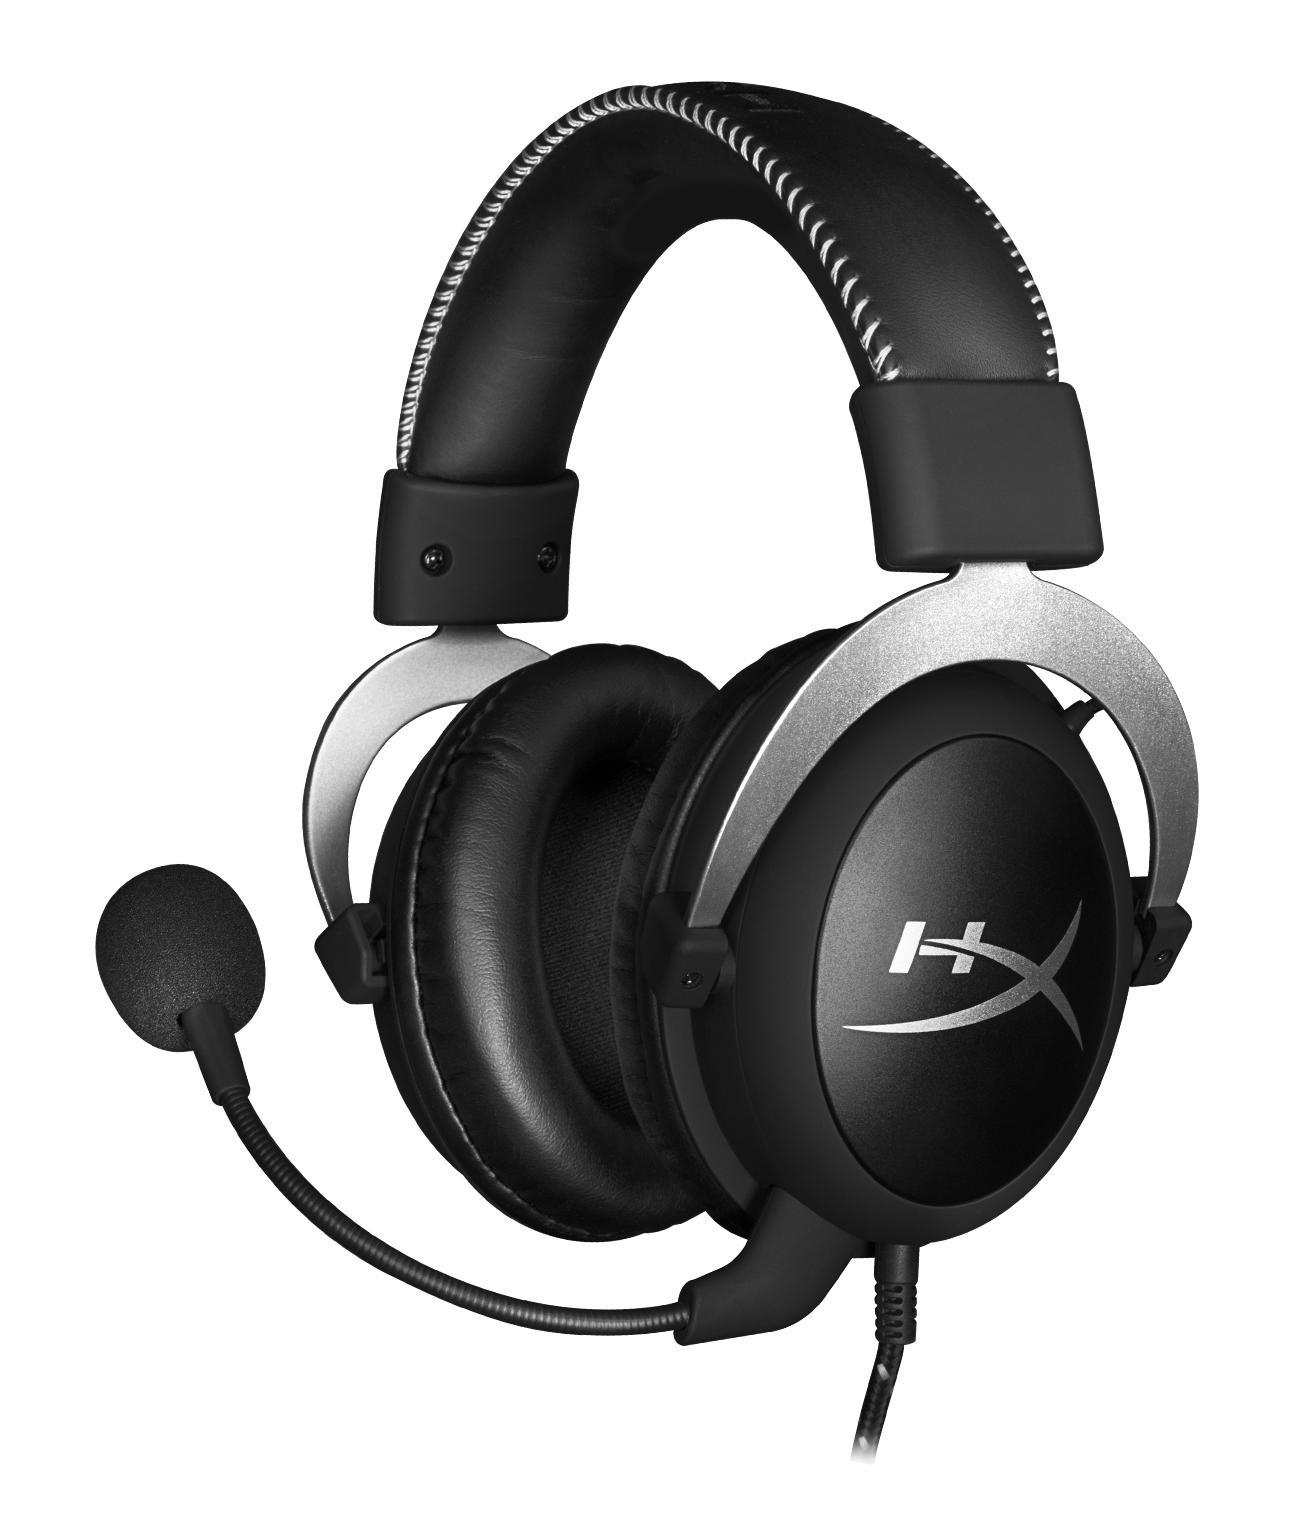 HyperX Cloud Pro Headset Head-band Black,Silver